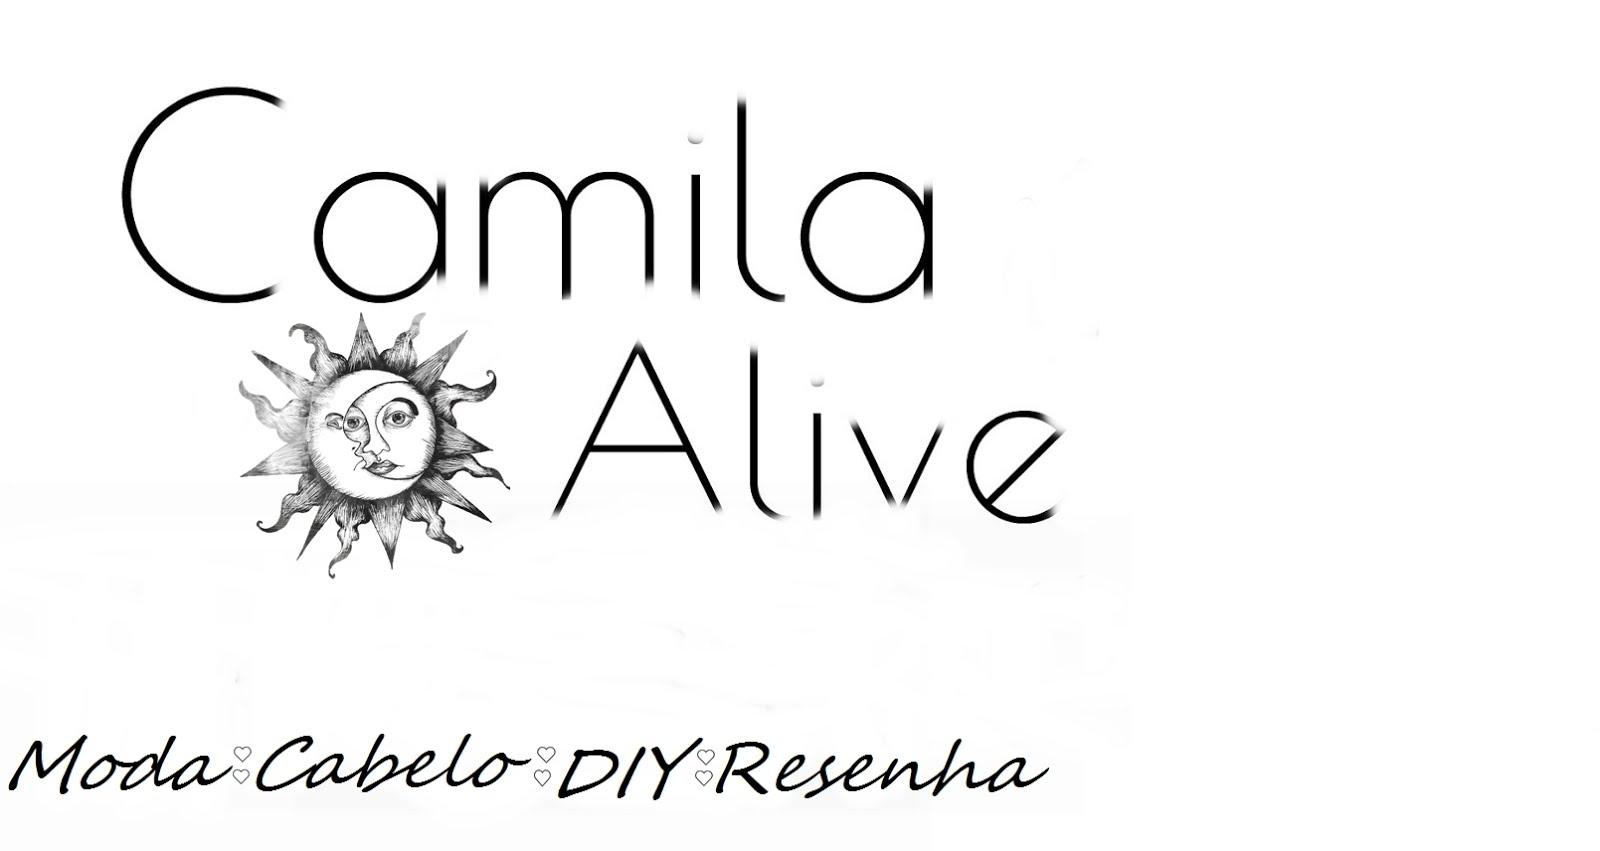 Camila Alive